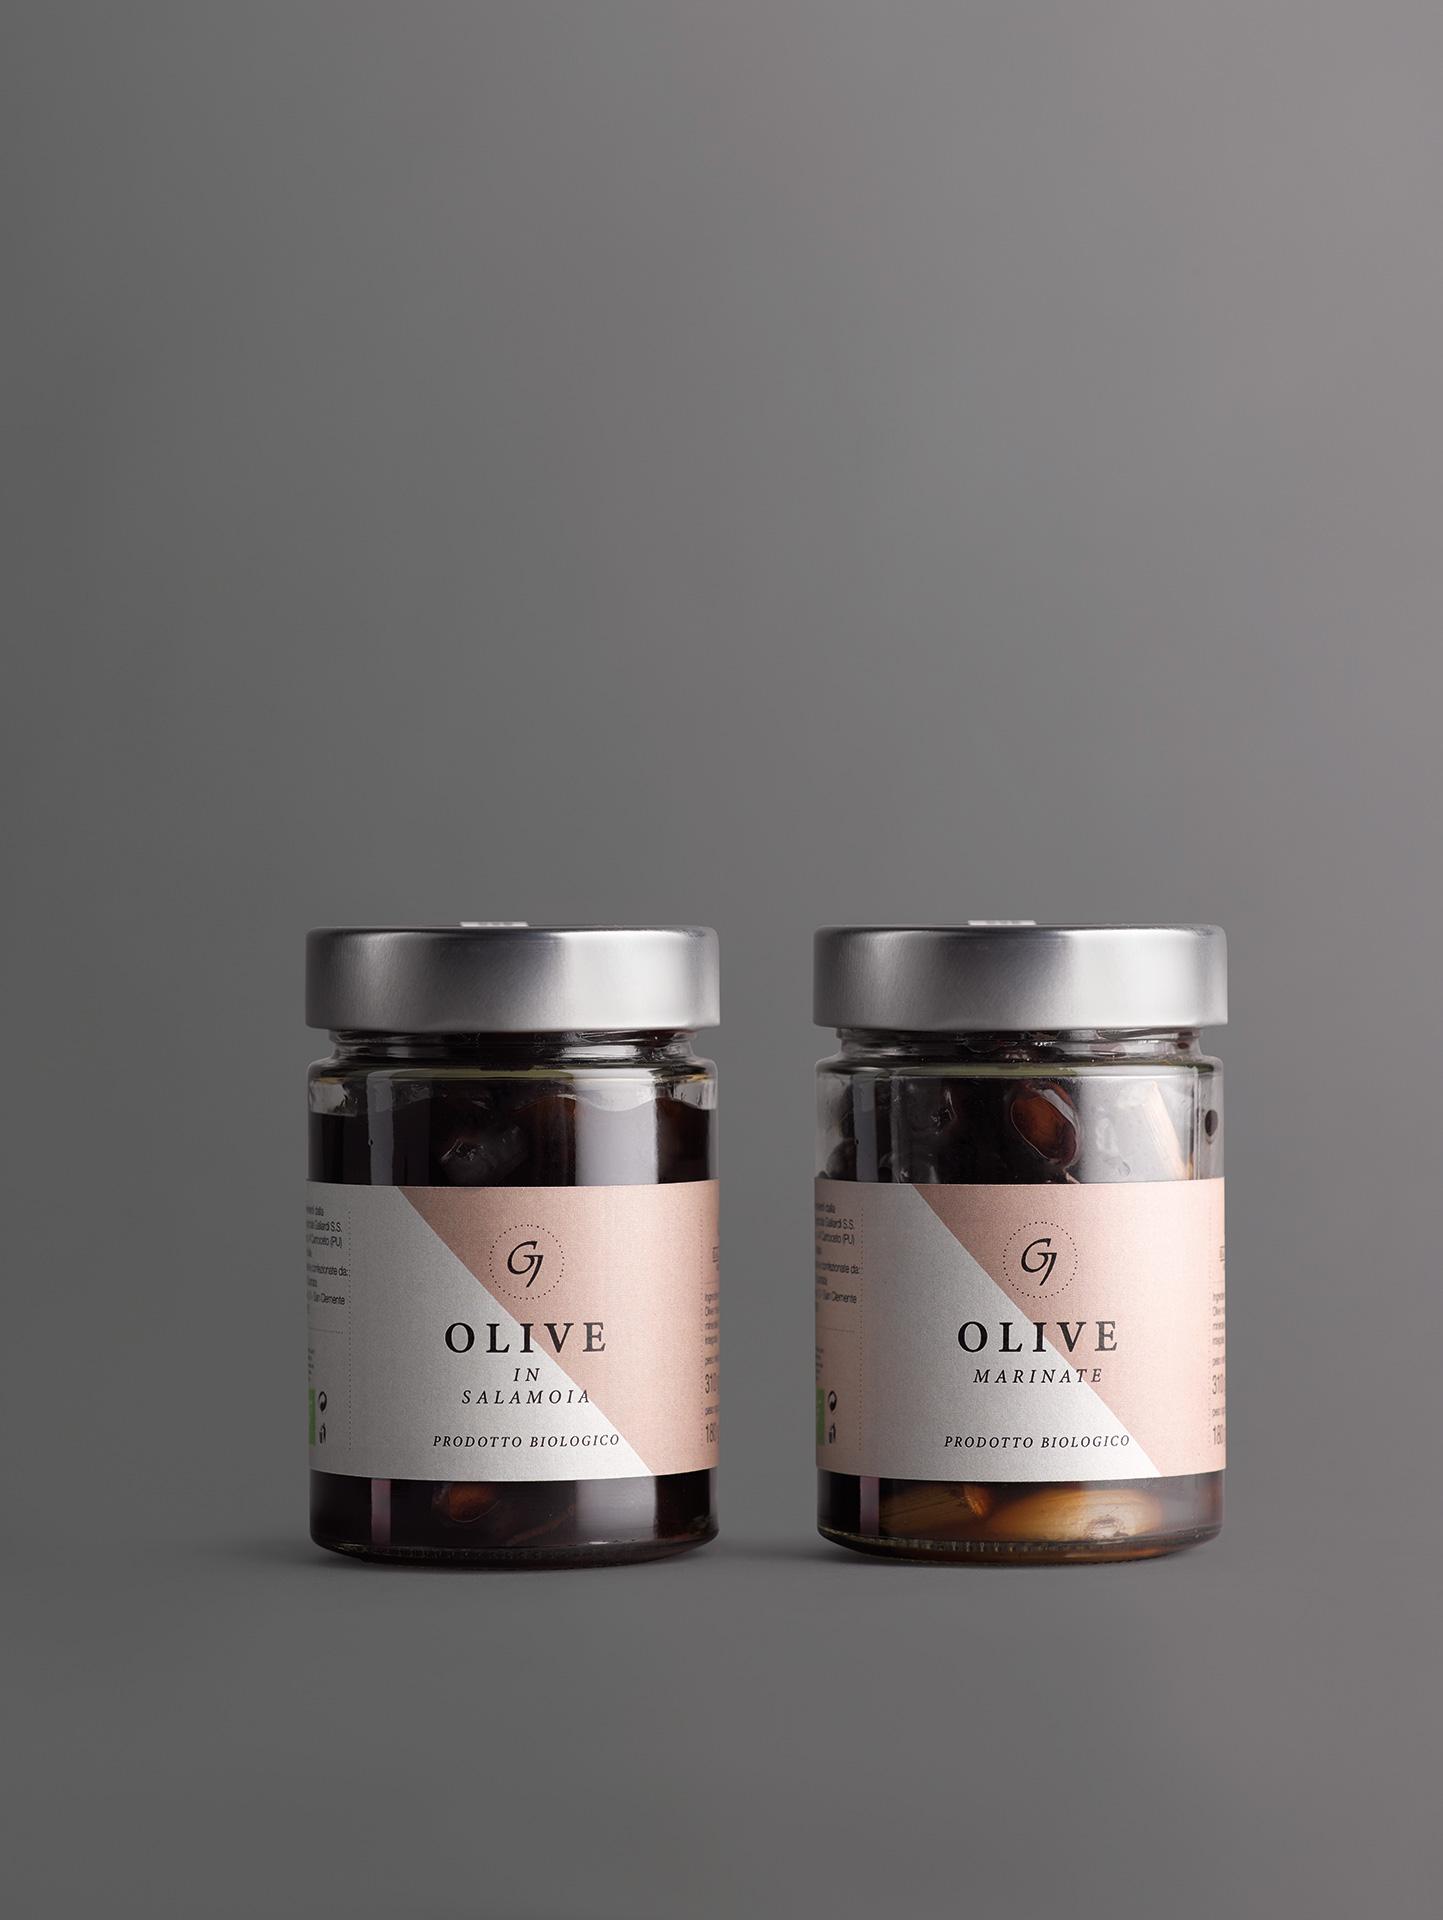 GALIARDI – Azienda Agricola Cartoceto – Olive in Salamoia e Olive Marinate